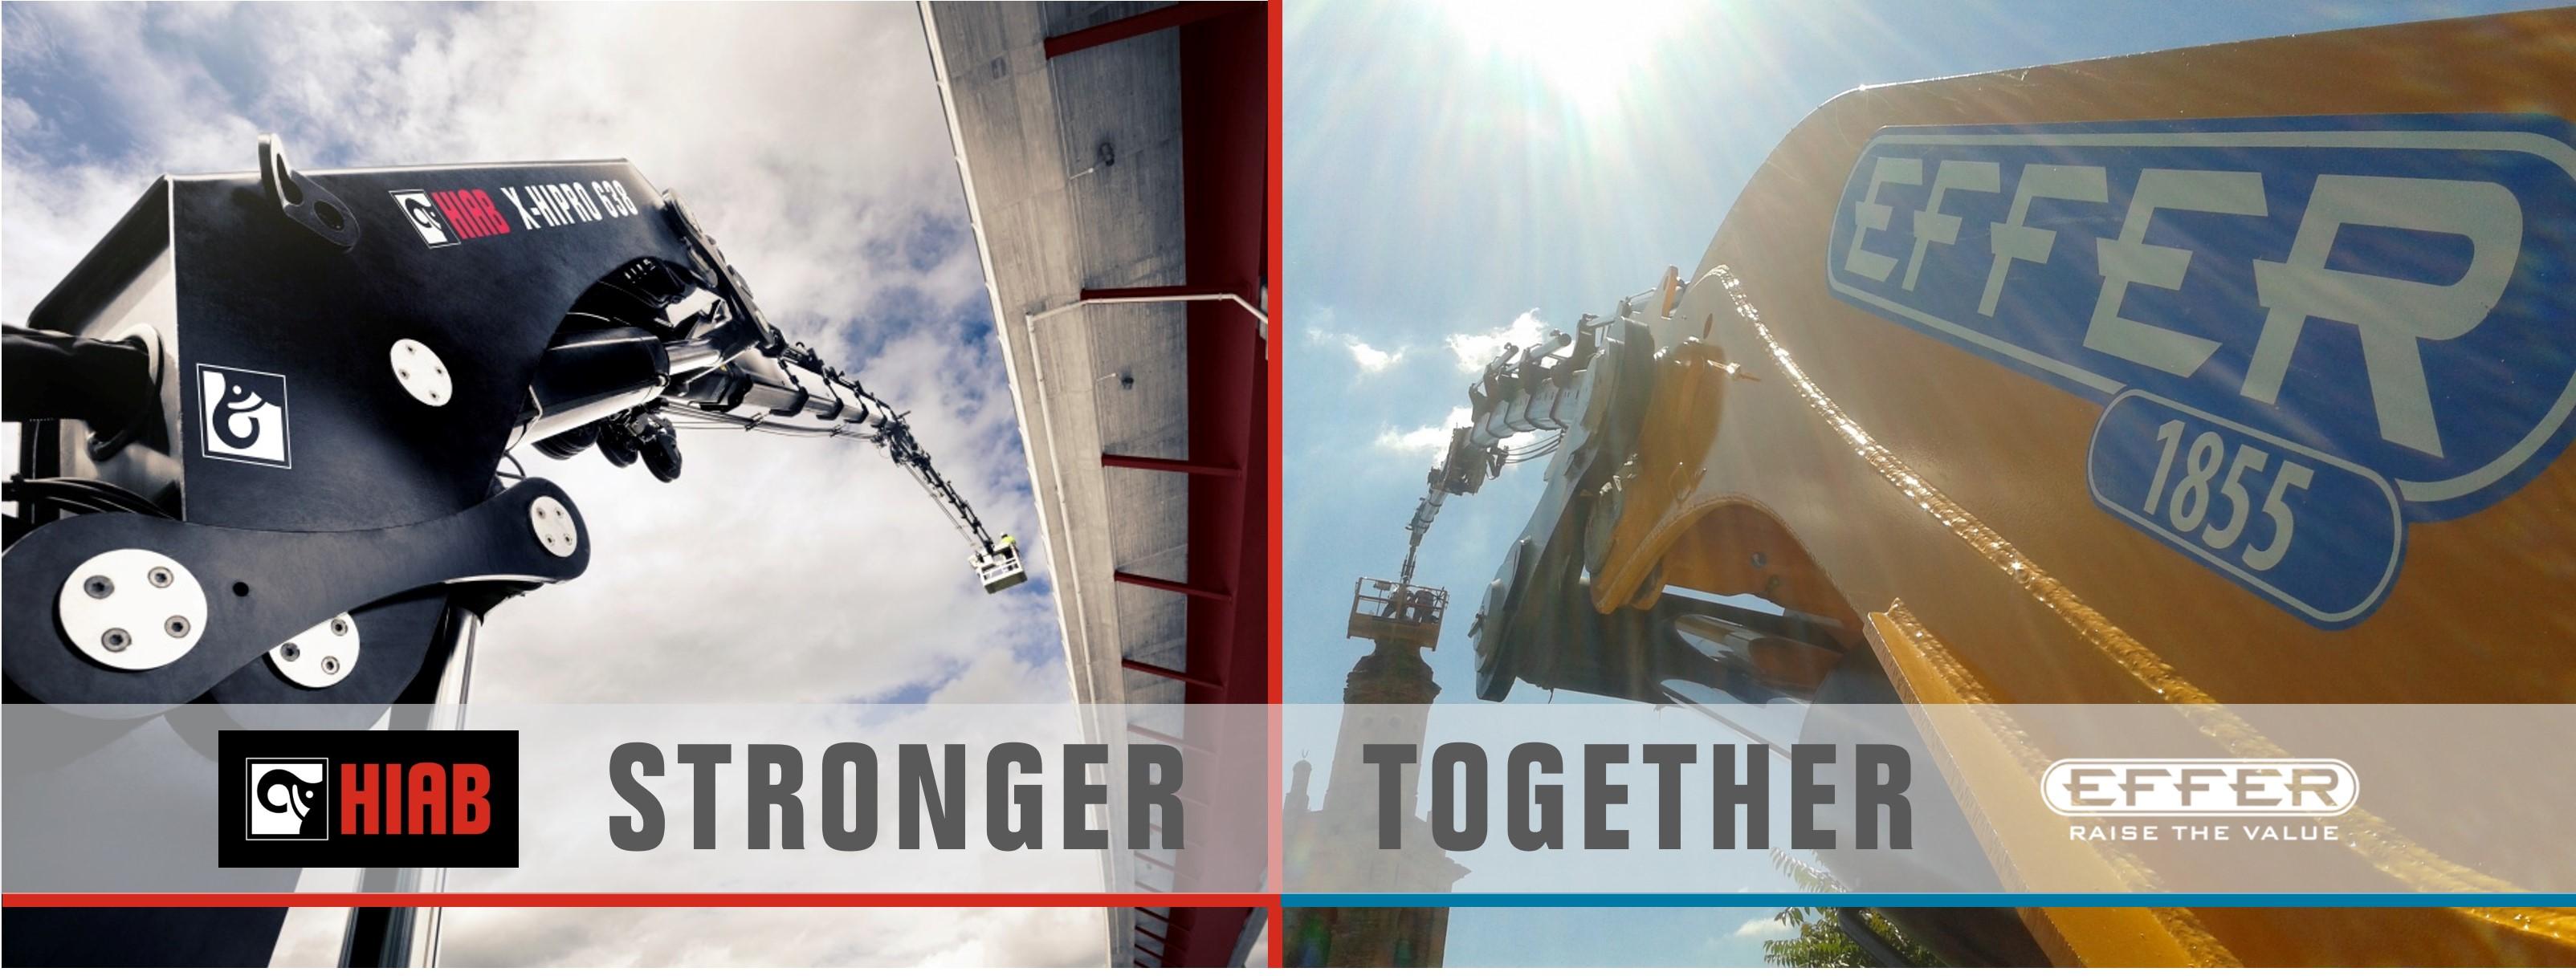 Hiab-Effer_Stronger Together_Signature